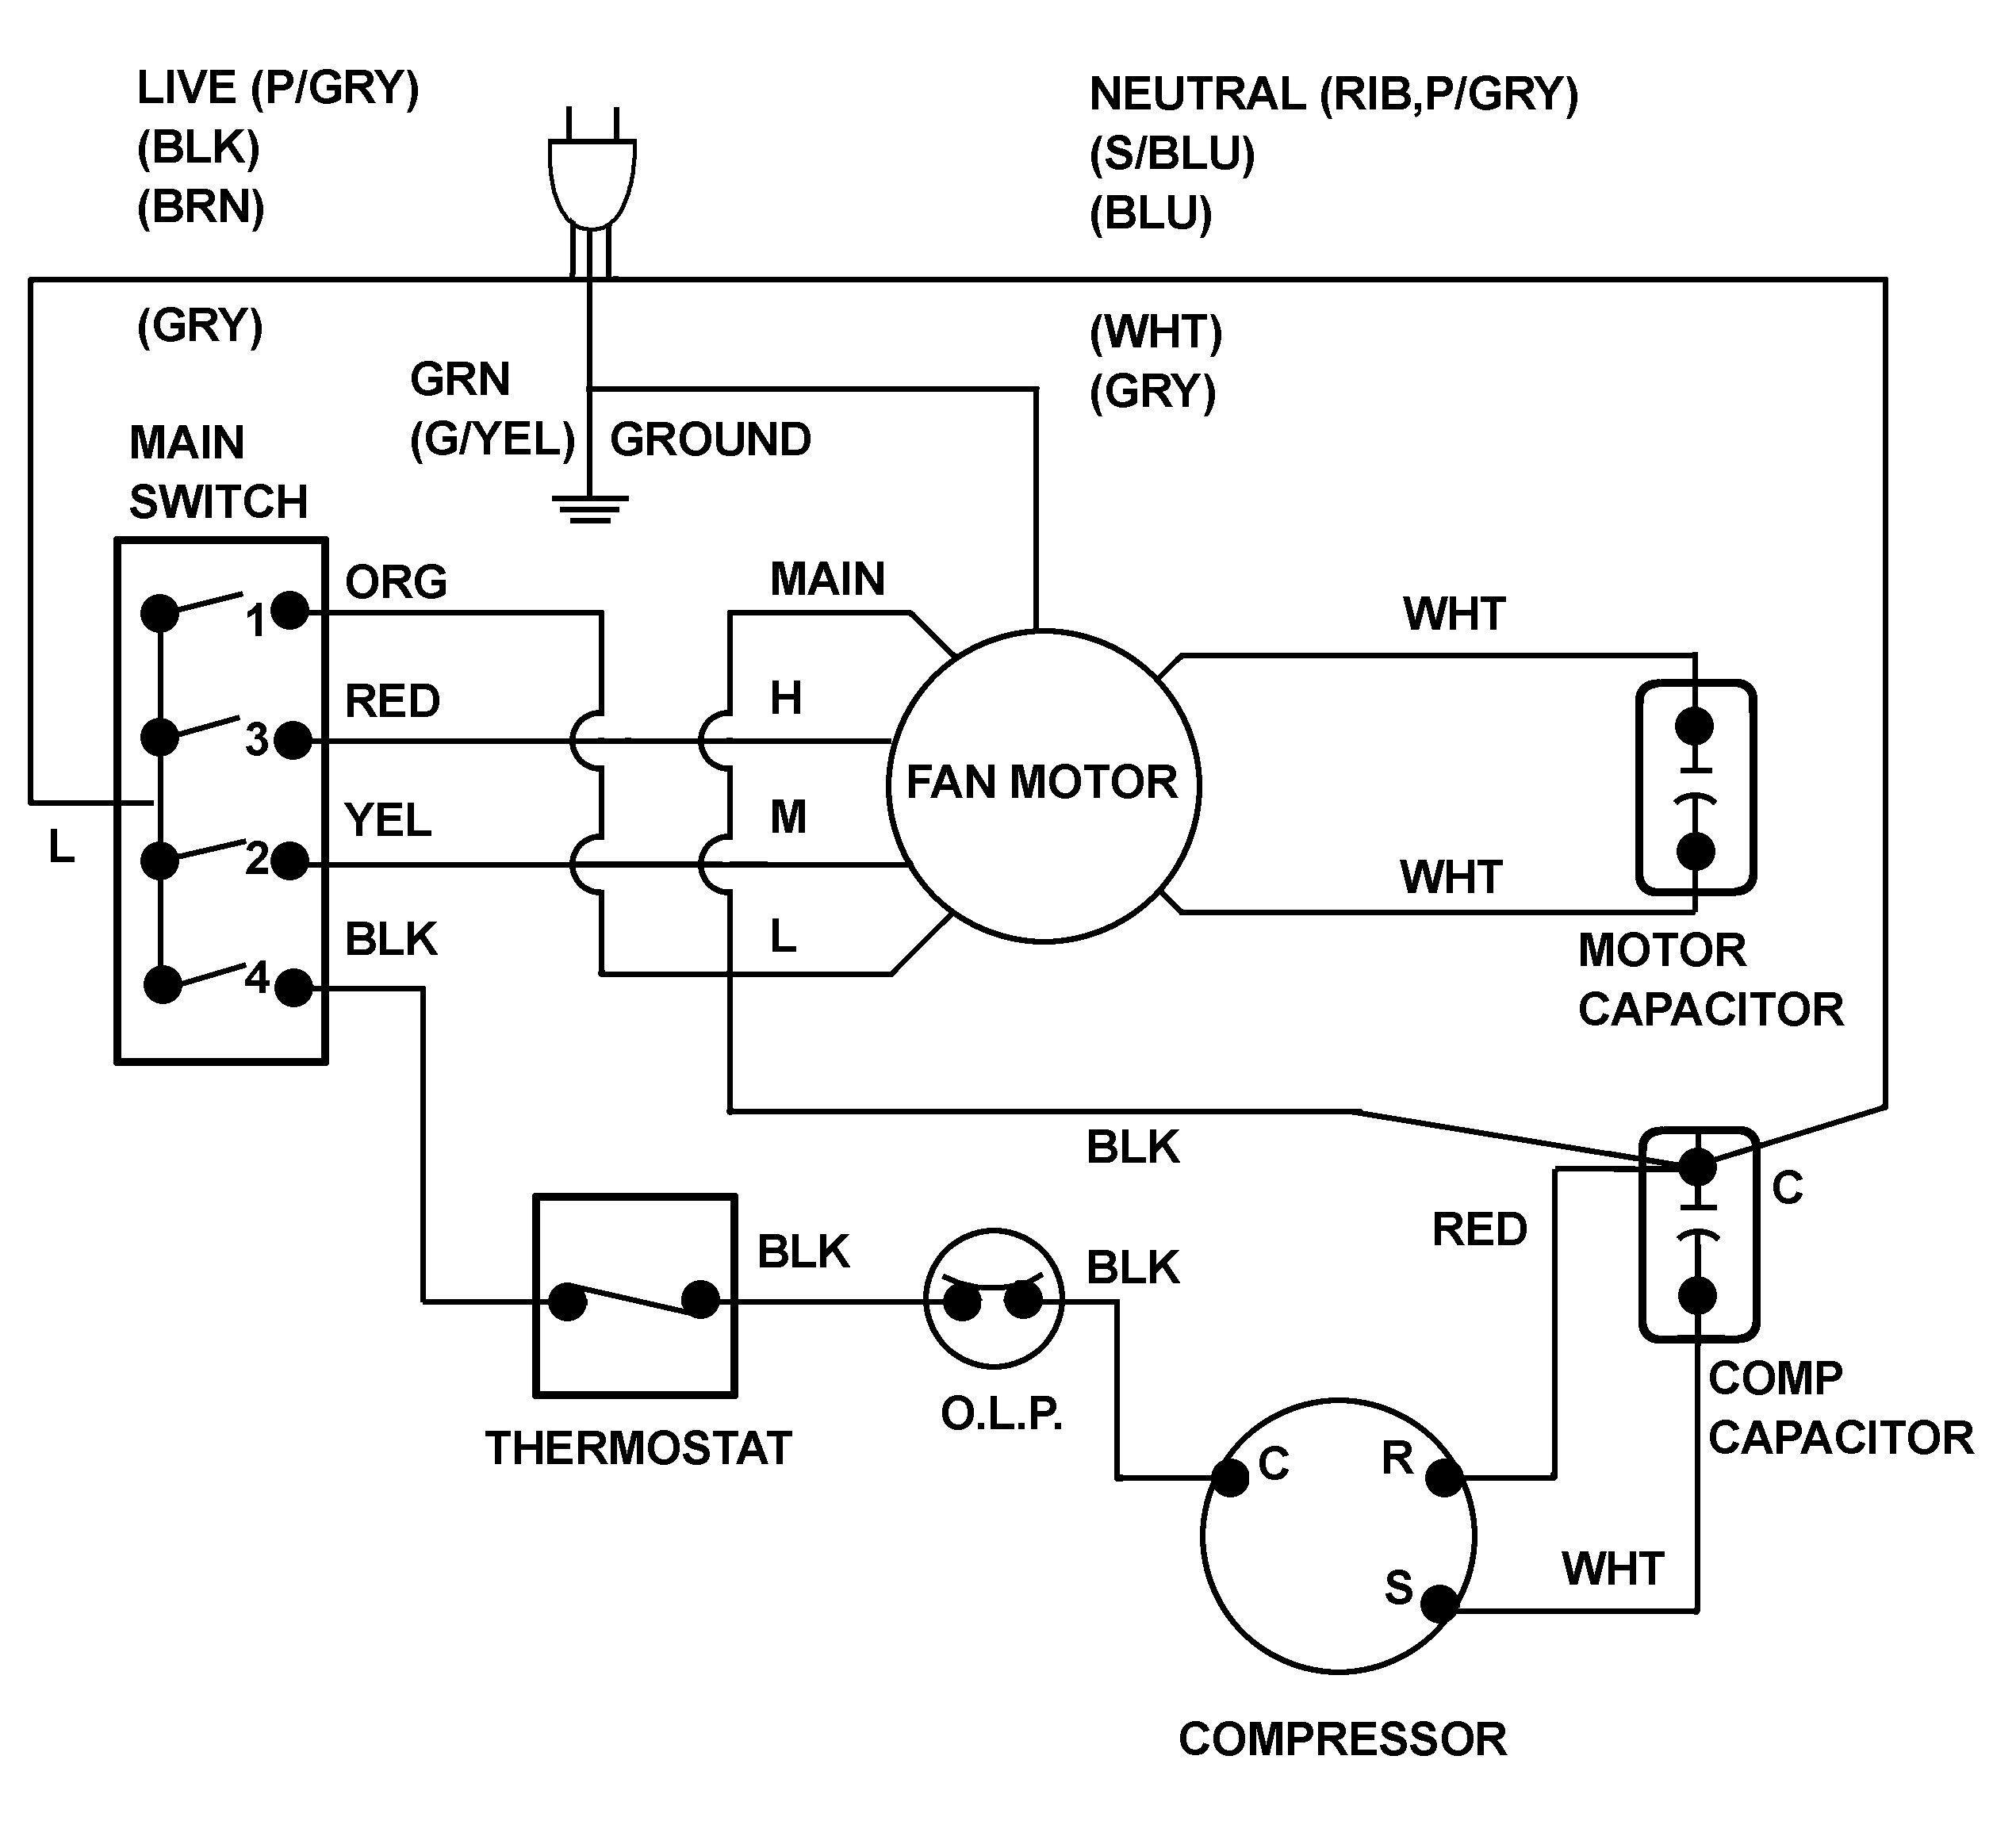 40 Phase Motor Wiring Diagram Low Voltage